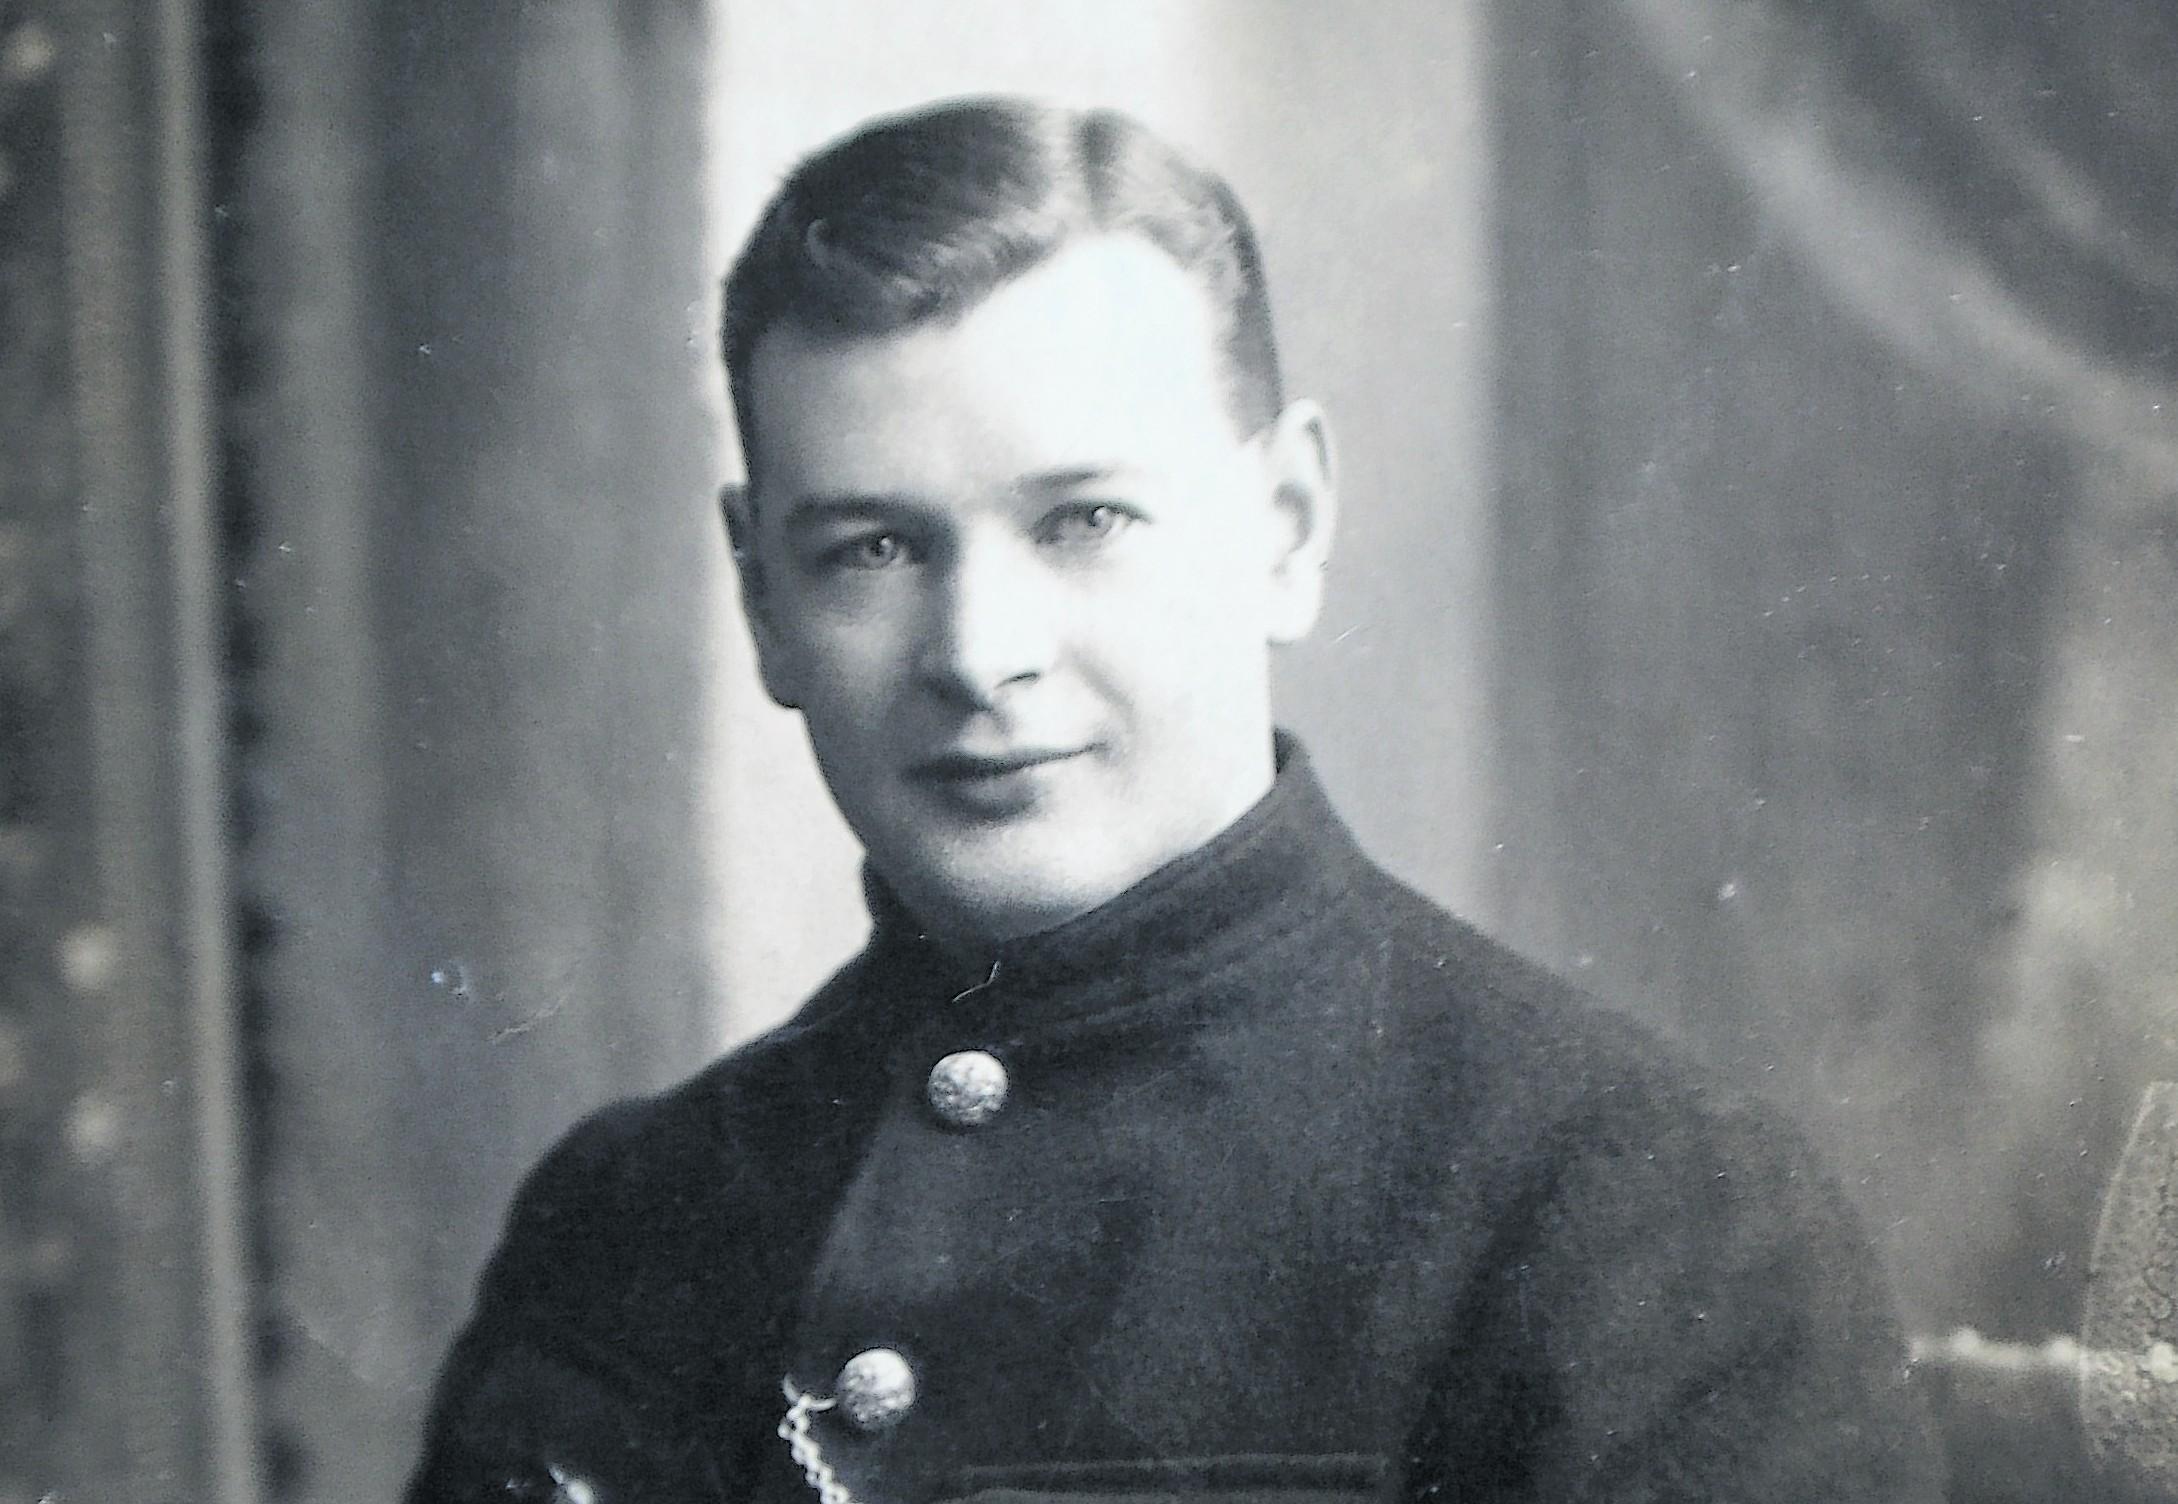 Kenneth Willox